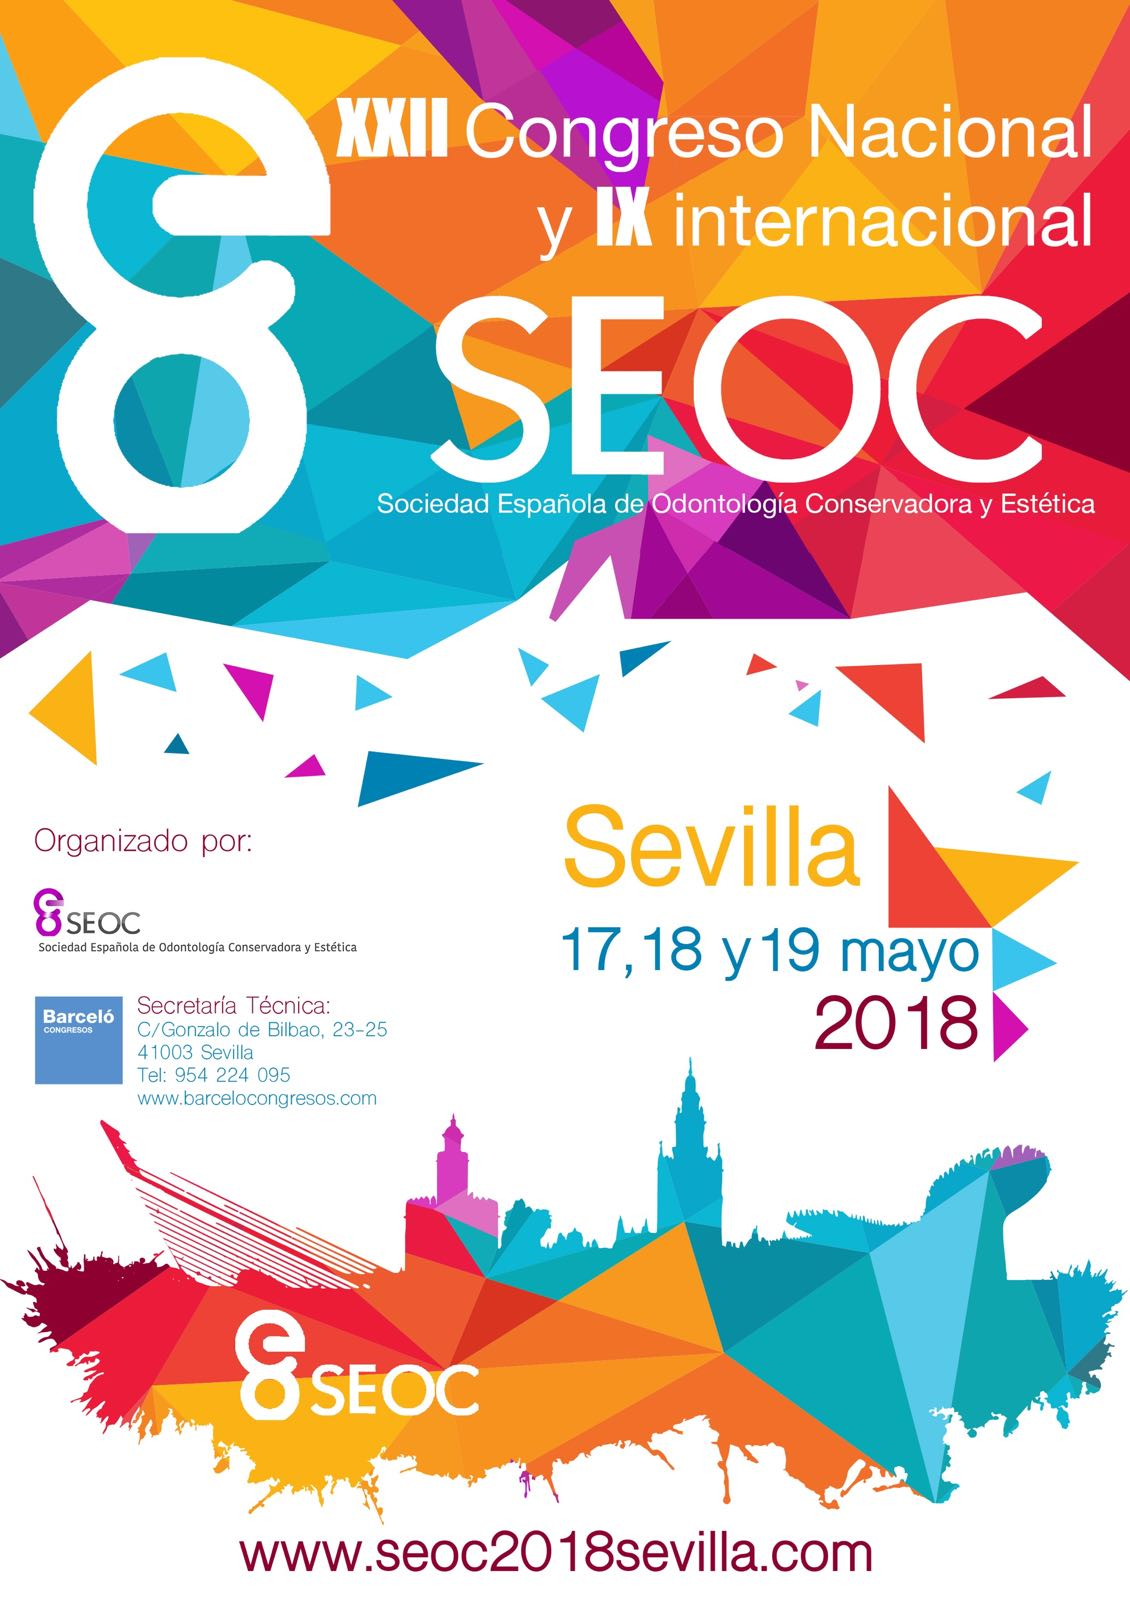 SEOC Seville 2018